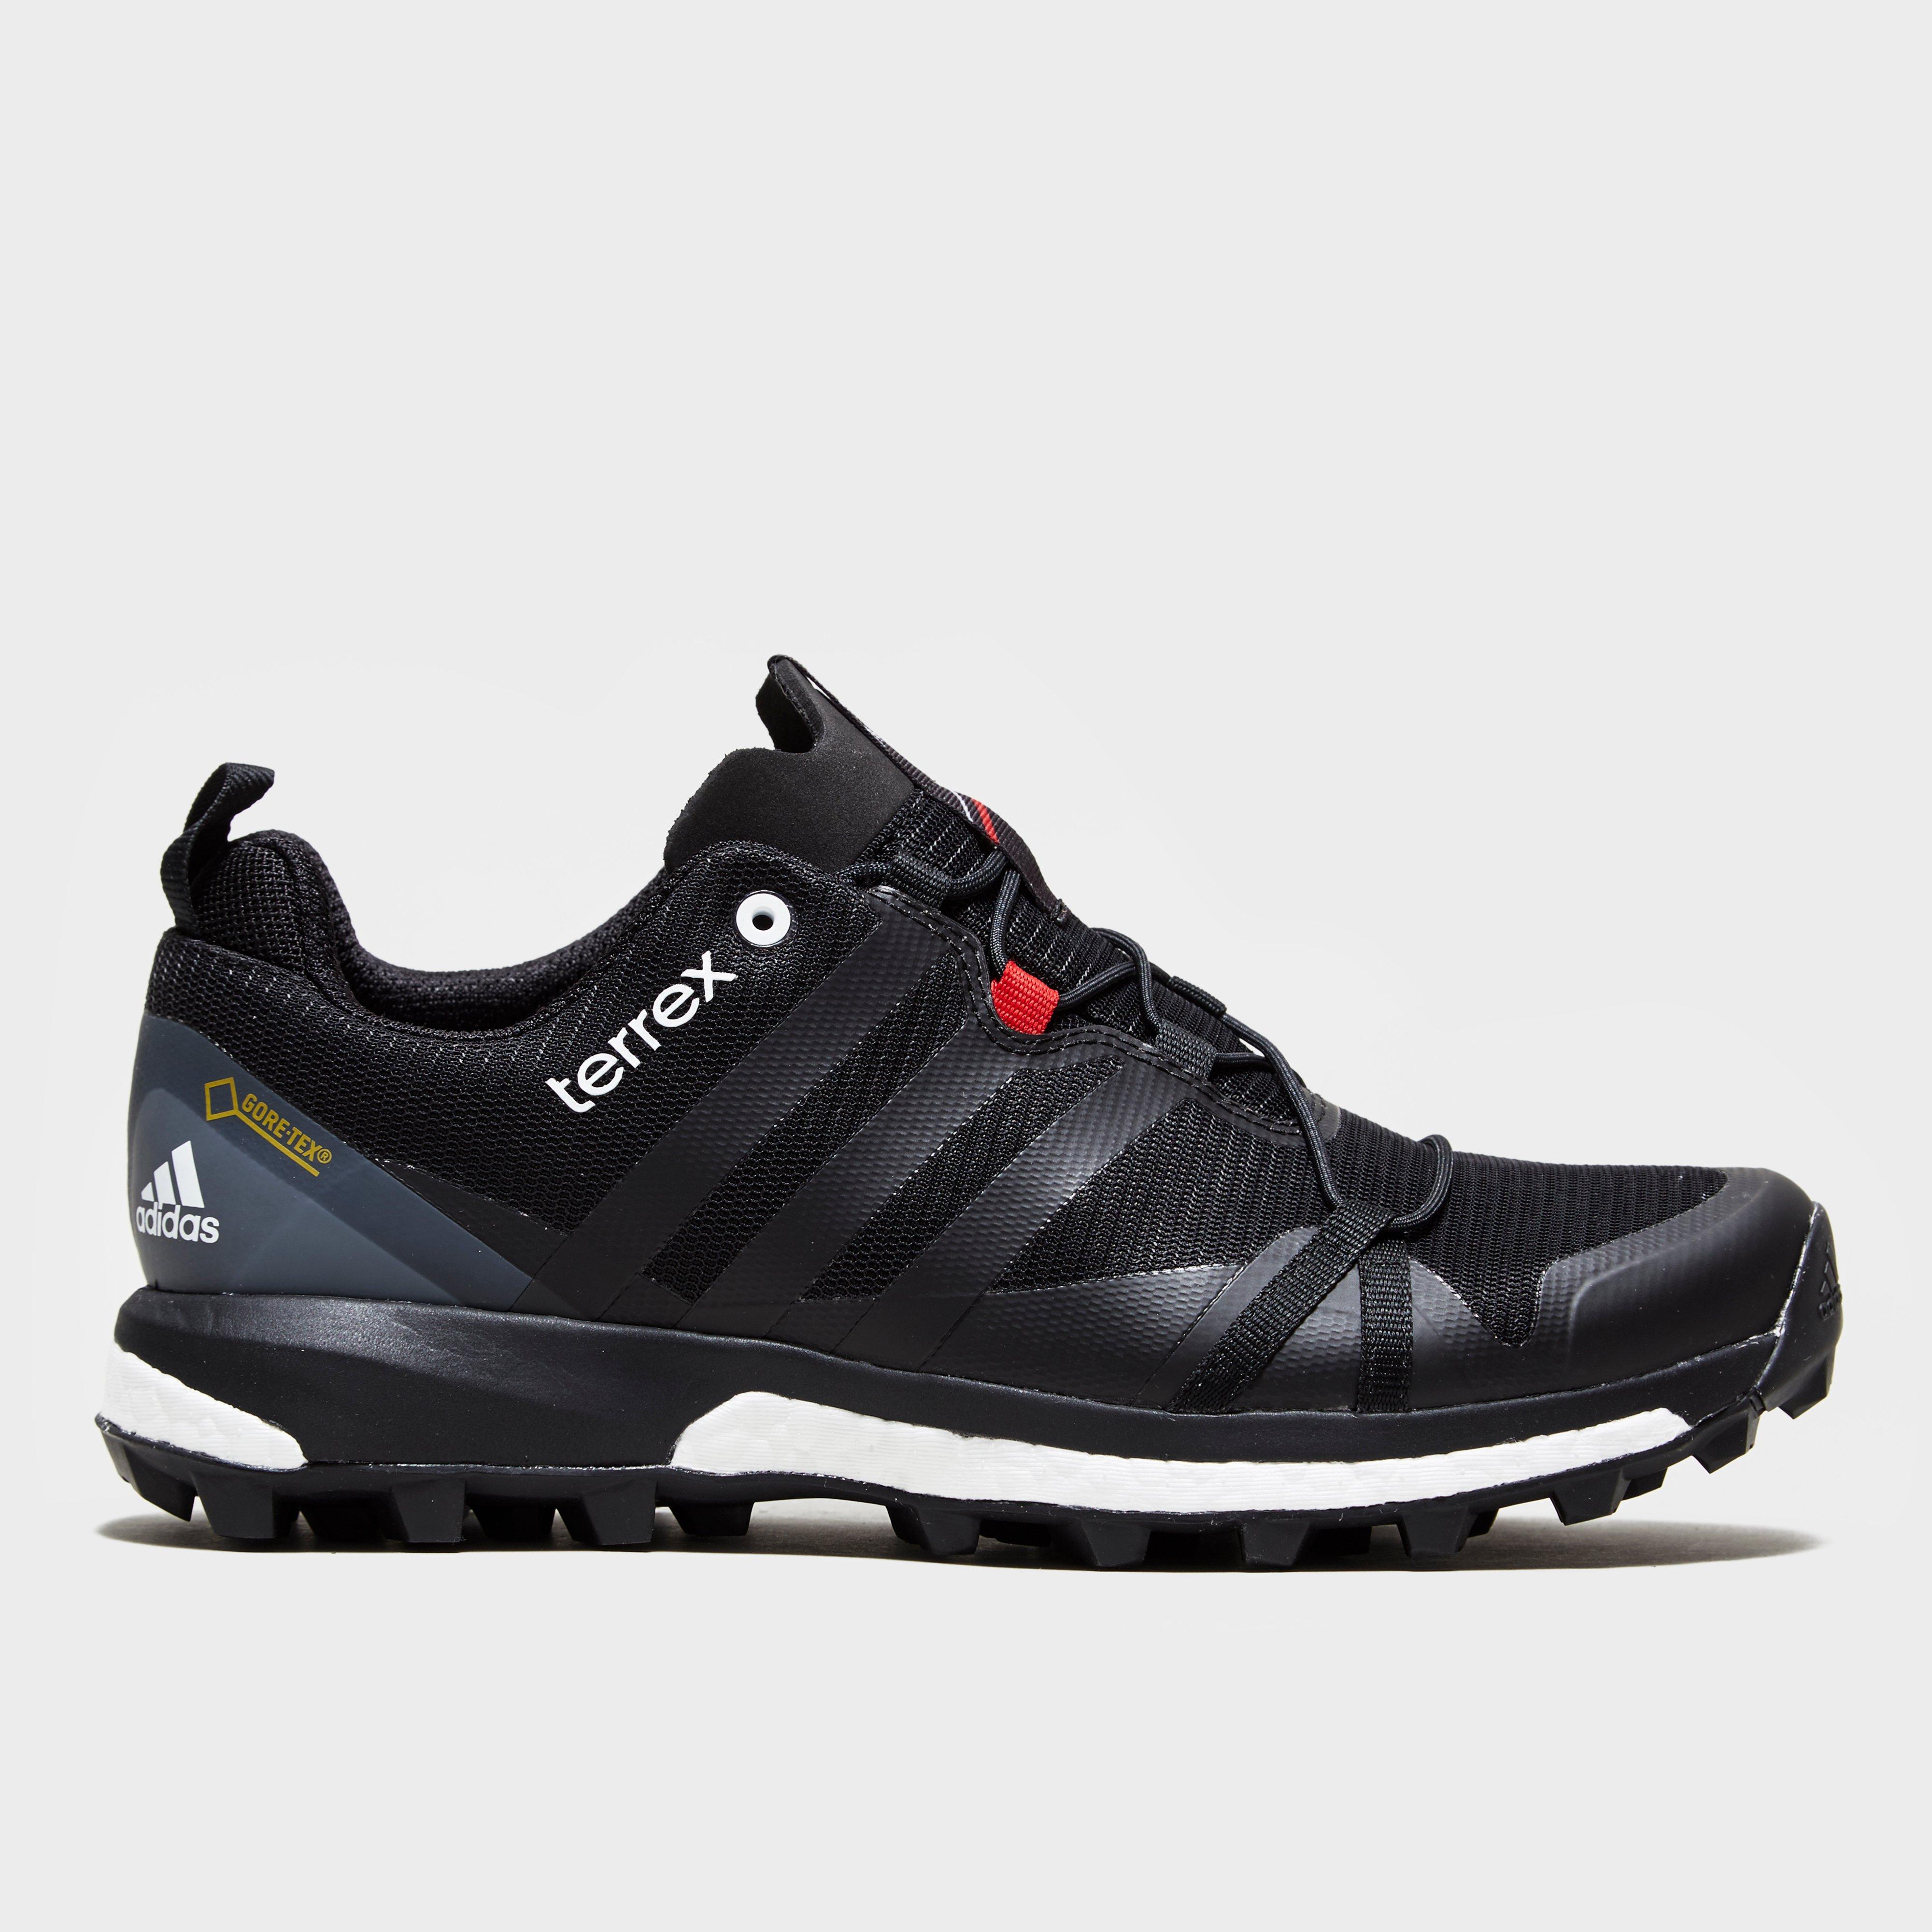 Adidas Mens Terrex Agravic Boost GORETEX Shoe Black